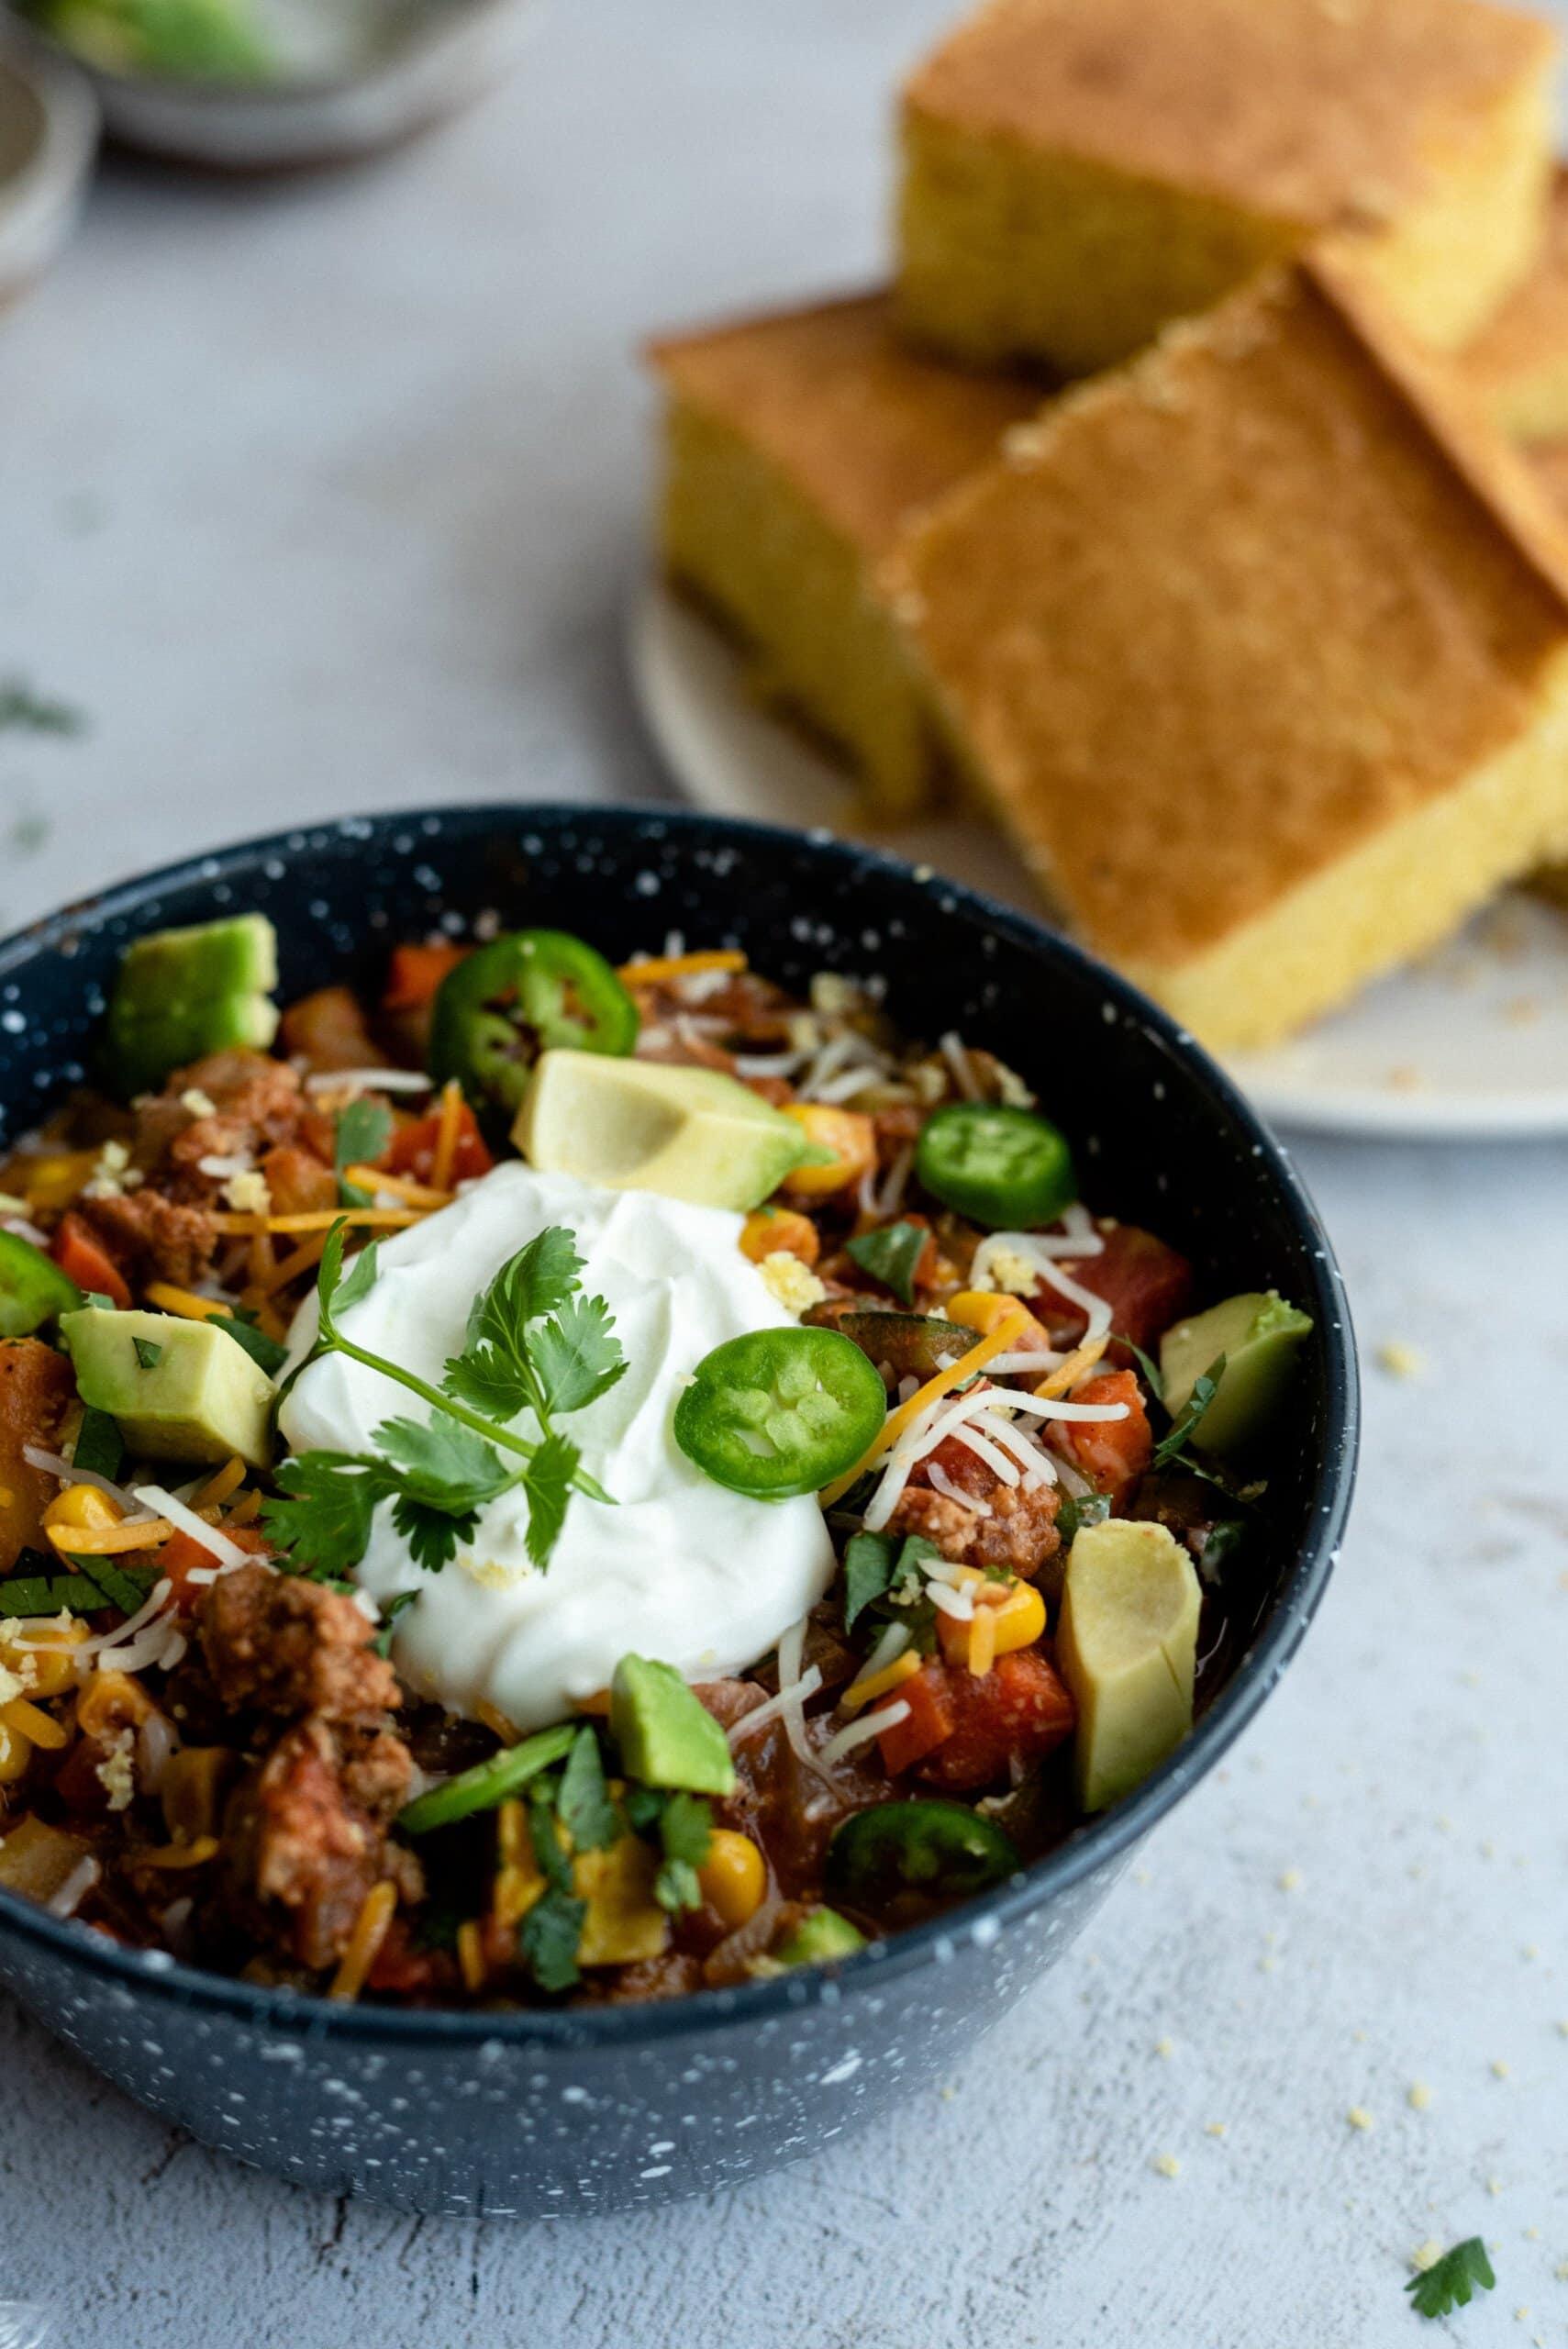 three quarter view of a bowl of chili next to cornbread